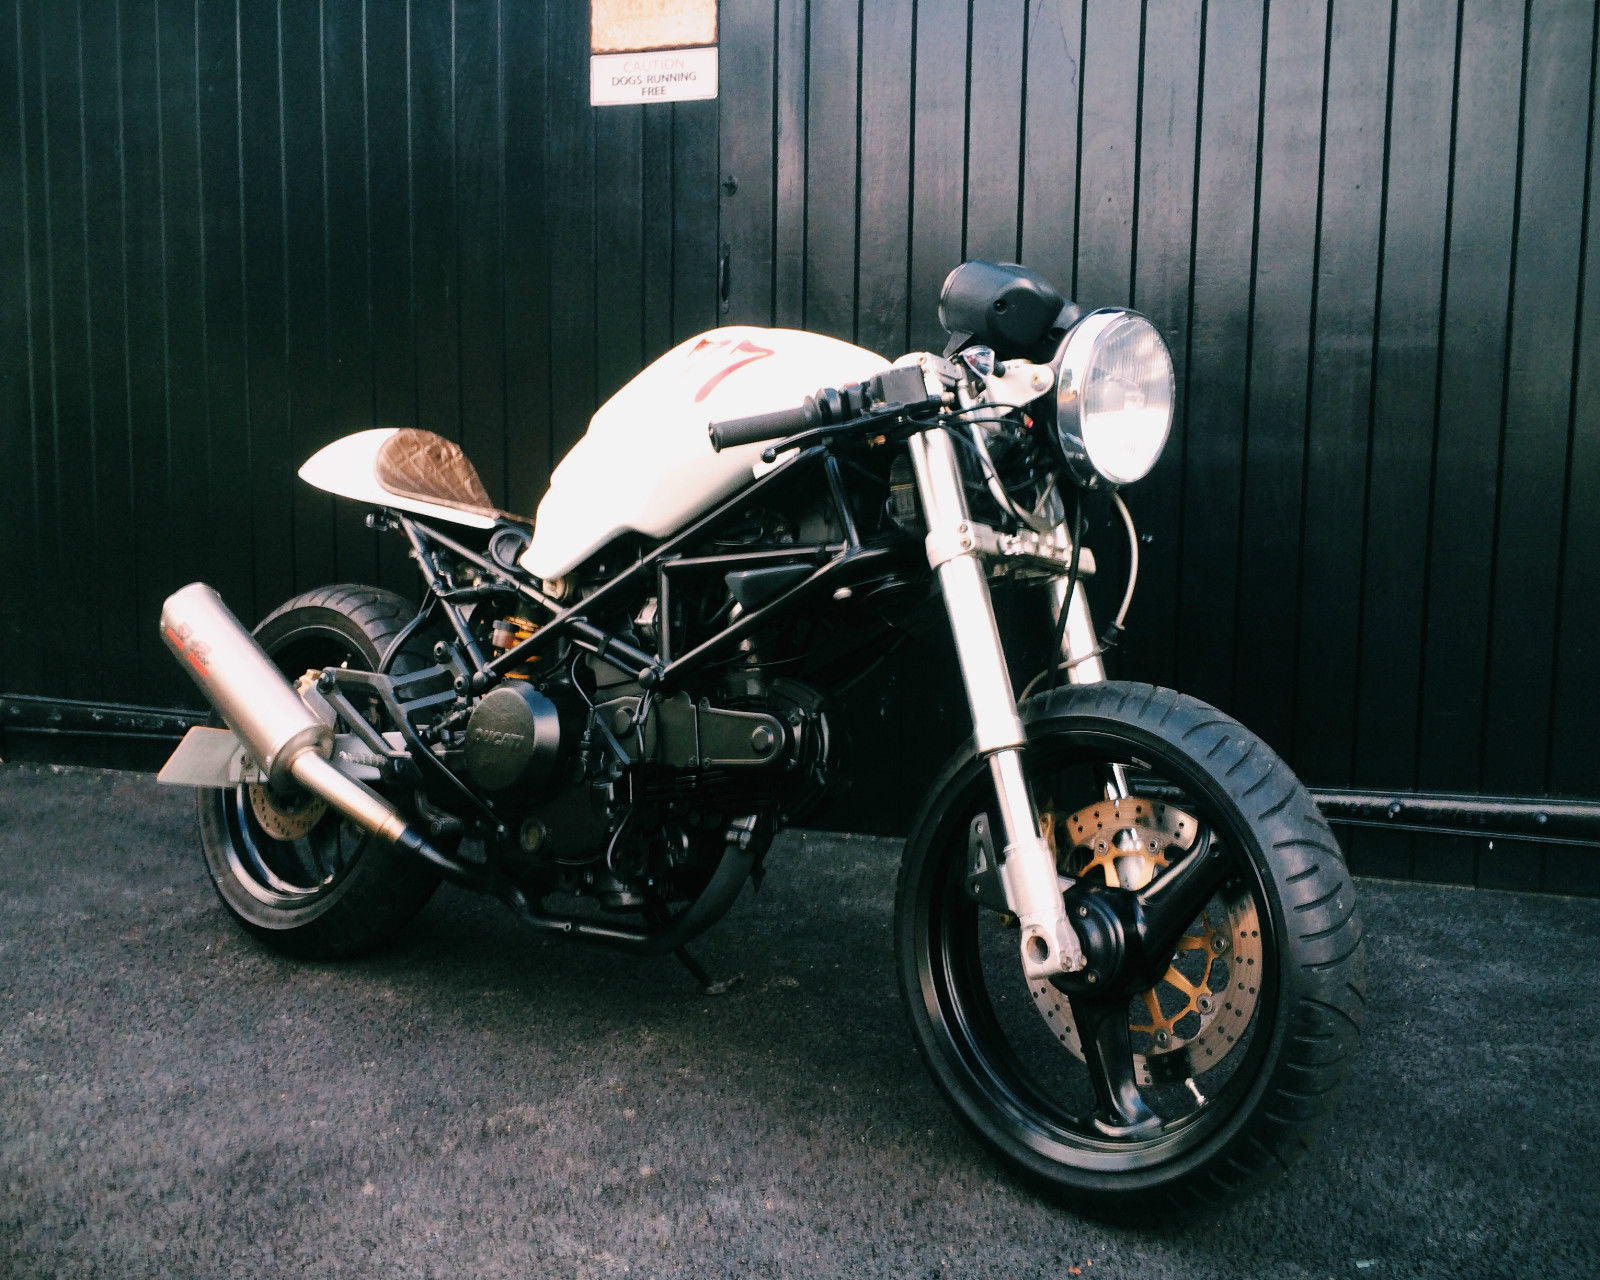 Ducati Cafe Racer Street Tracker Bobber Brat Custom Classic Vintage